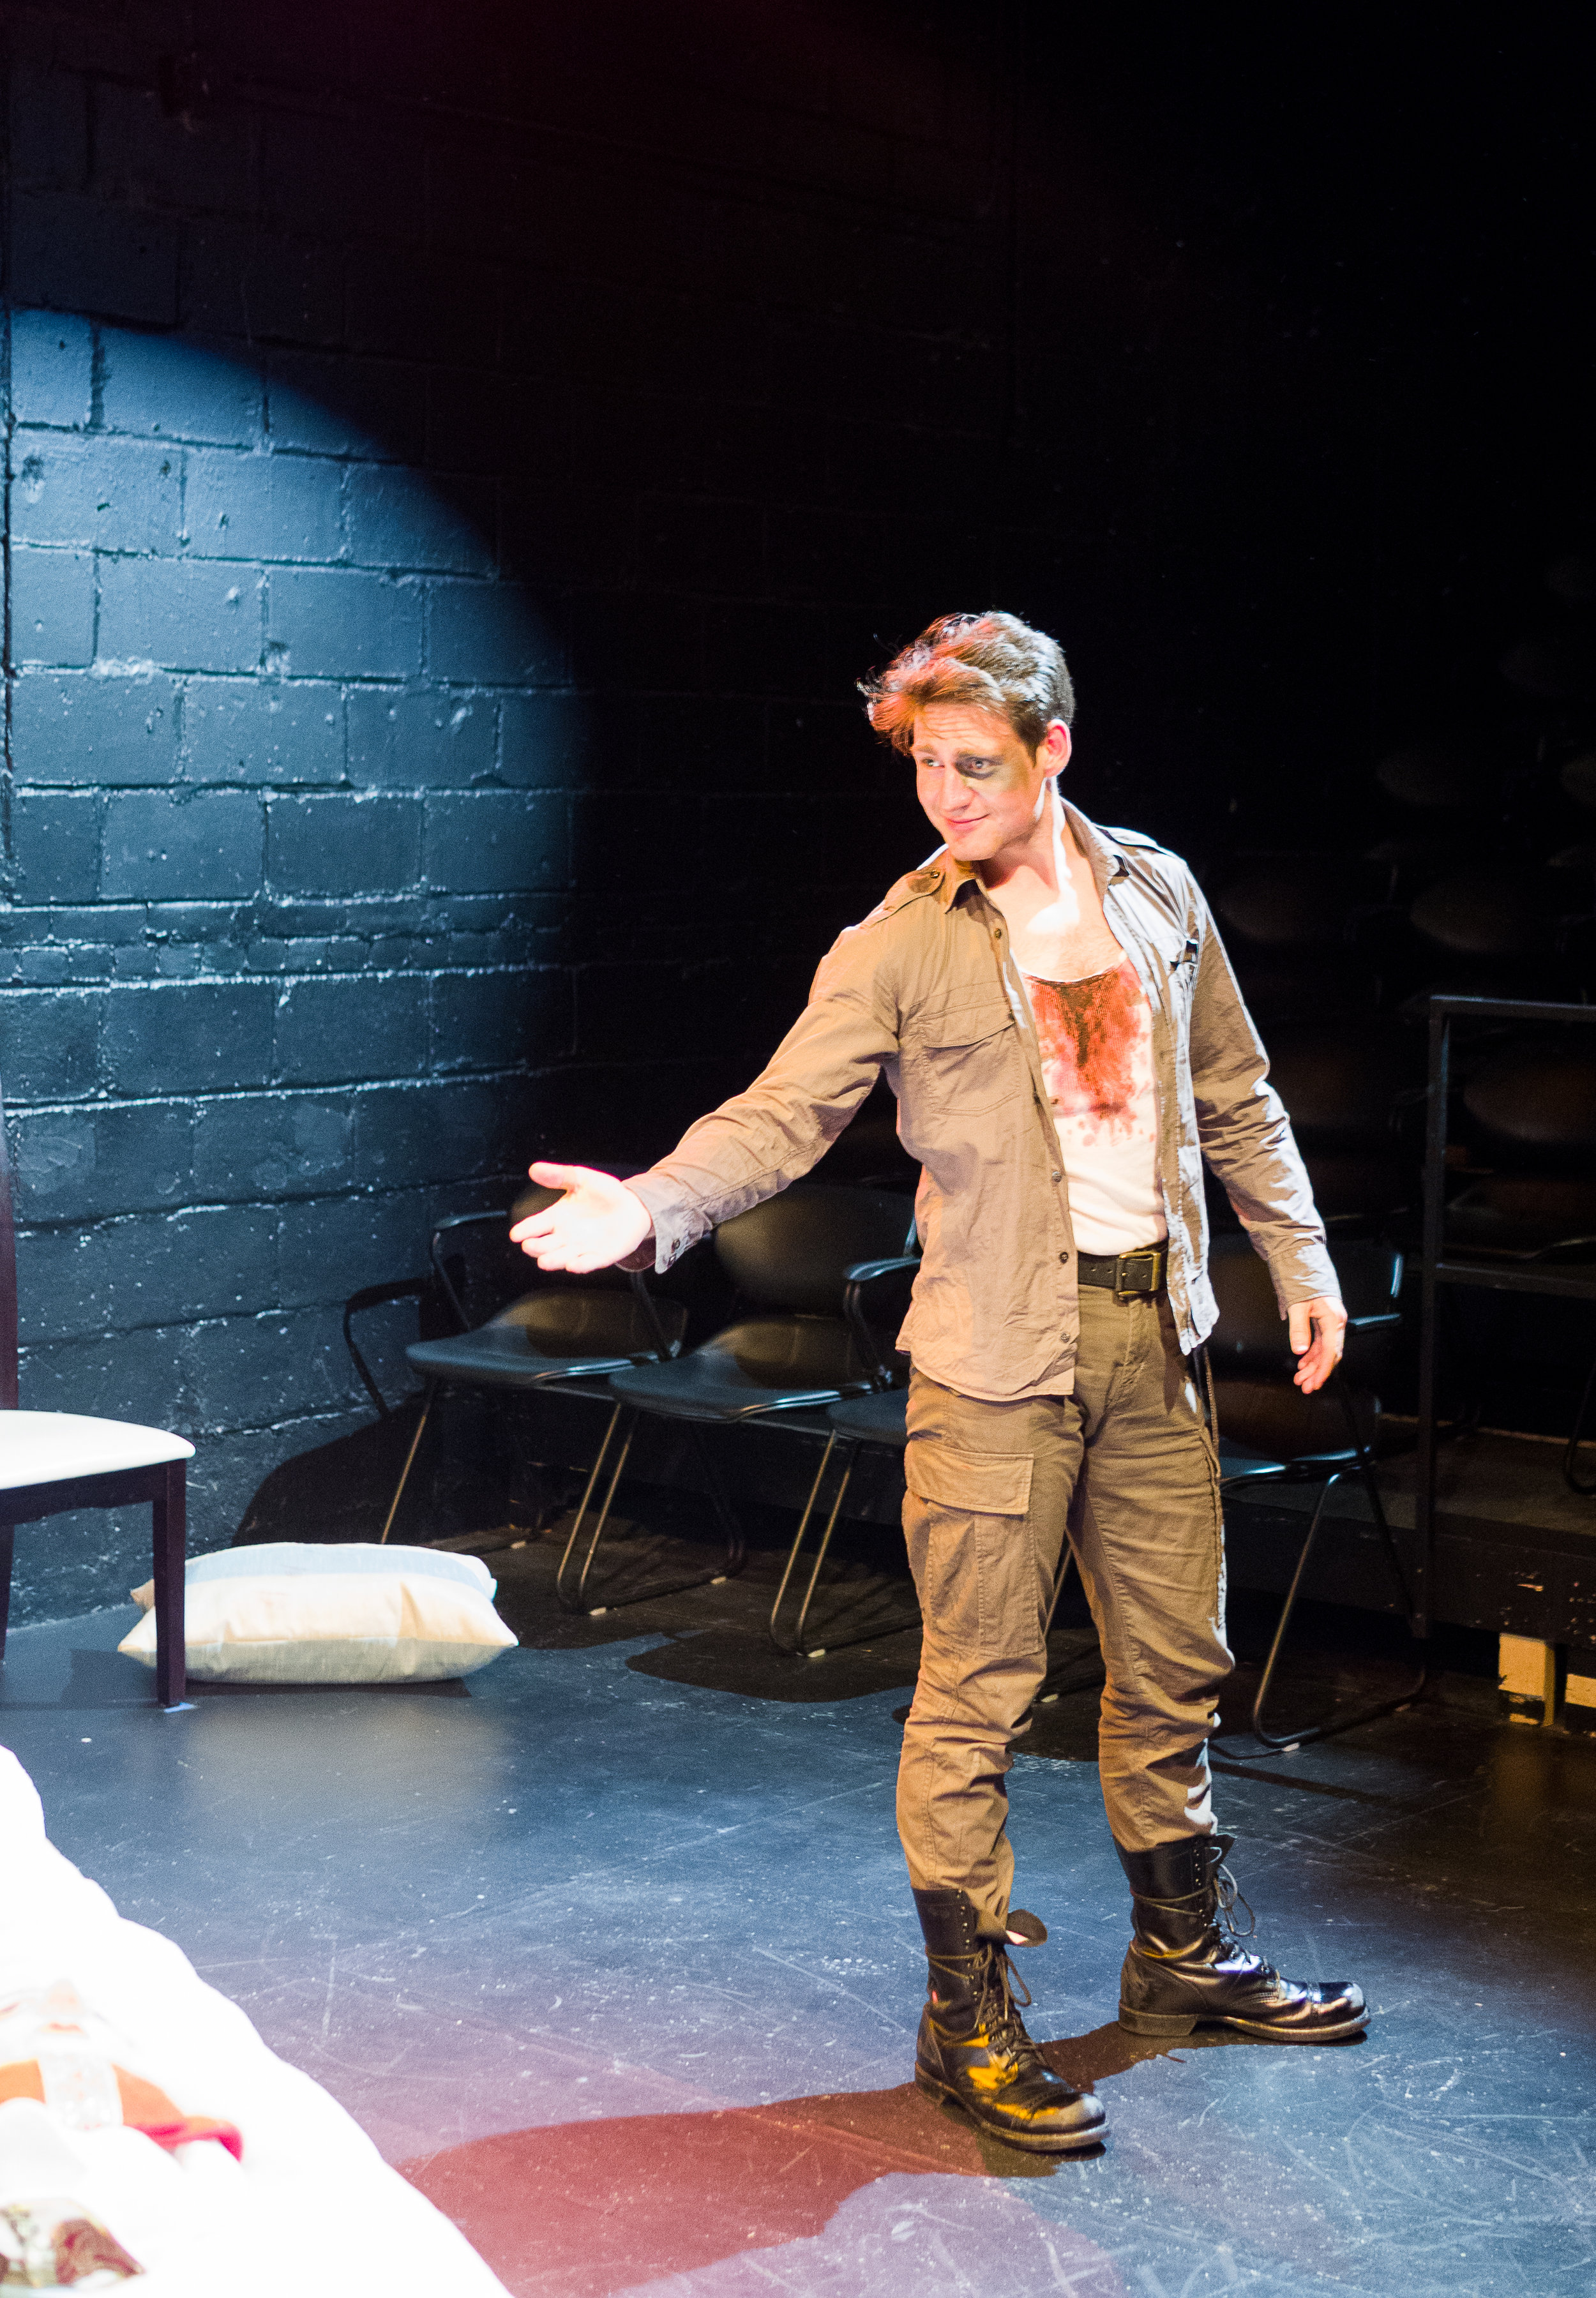 Dewey Stewart as Giovanni. Costume by Jan Venus; lighting design by Waleed Ansari. Photography by Rene Stakenborg.